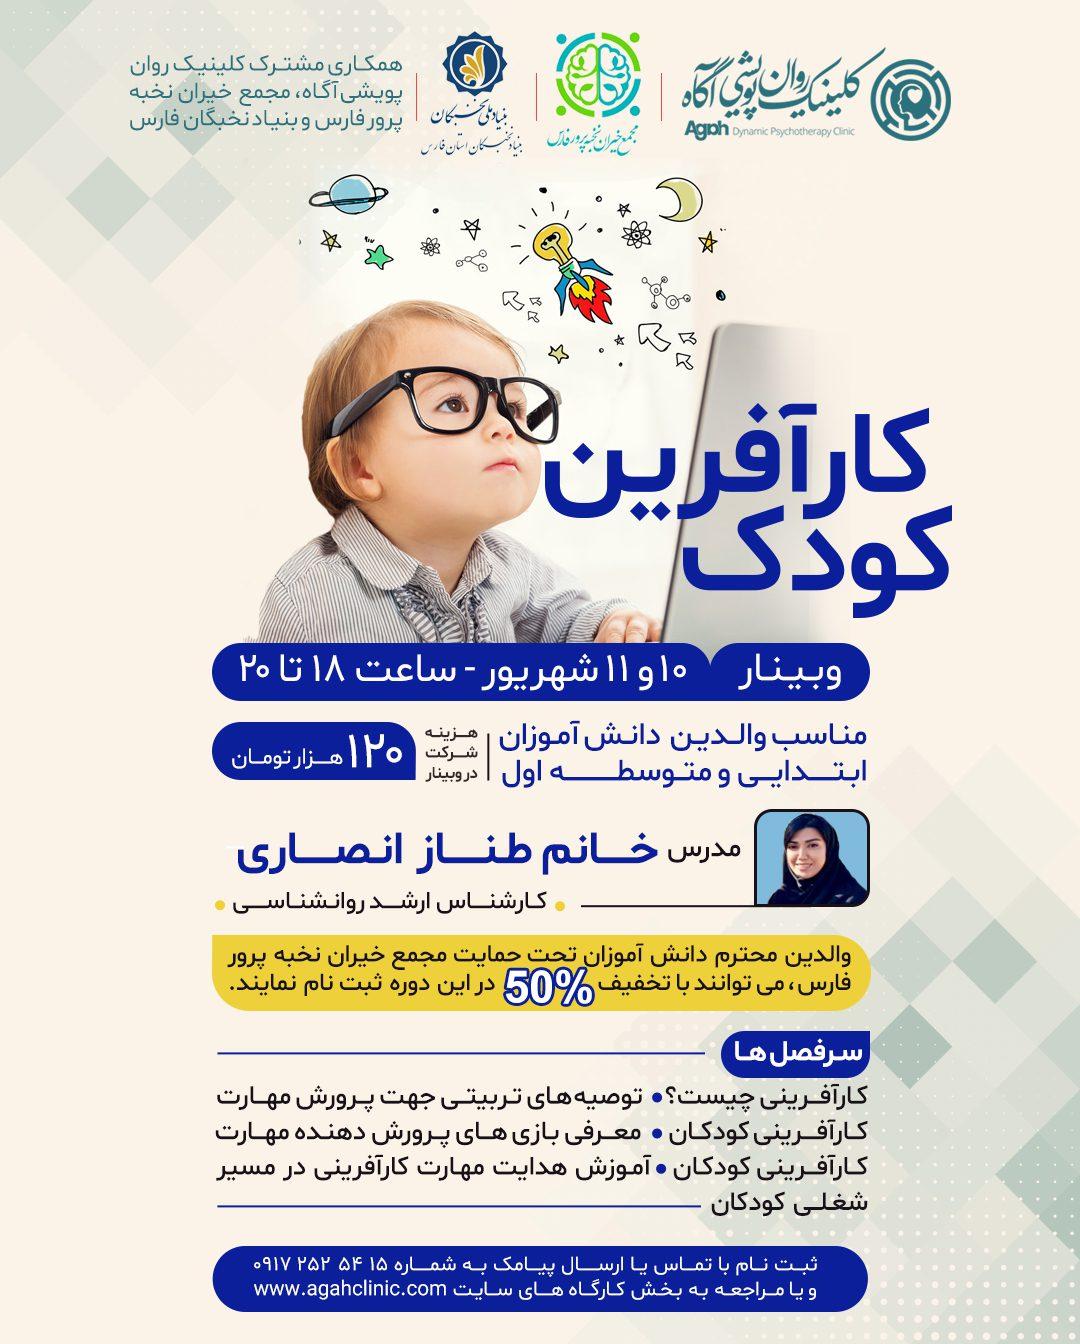 وبینار کودک کارآفرین